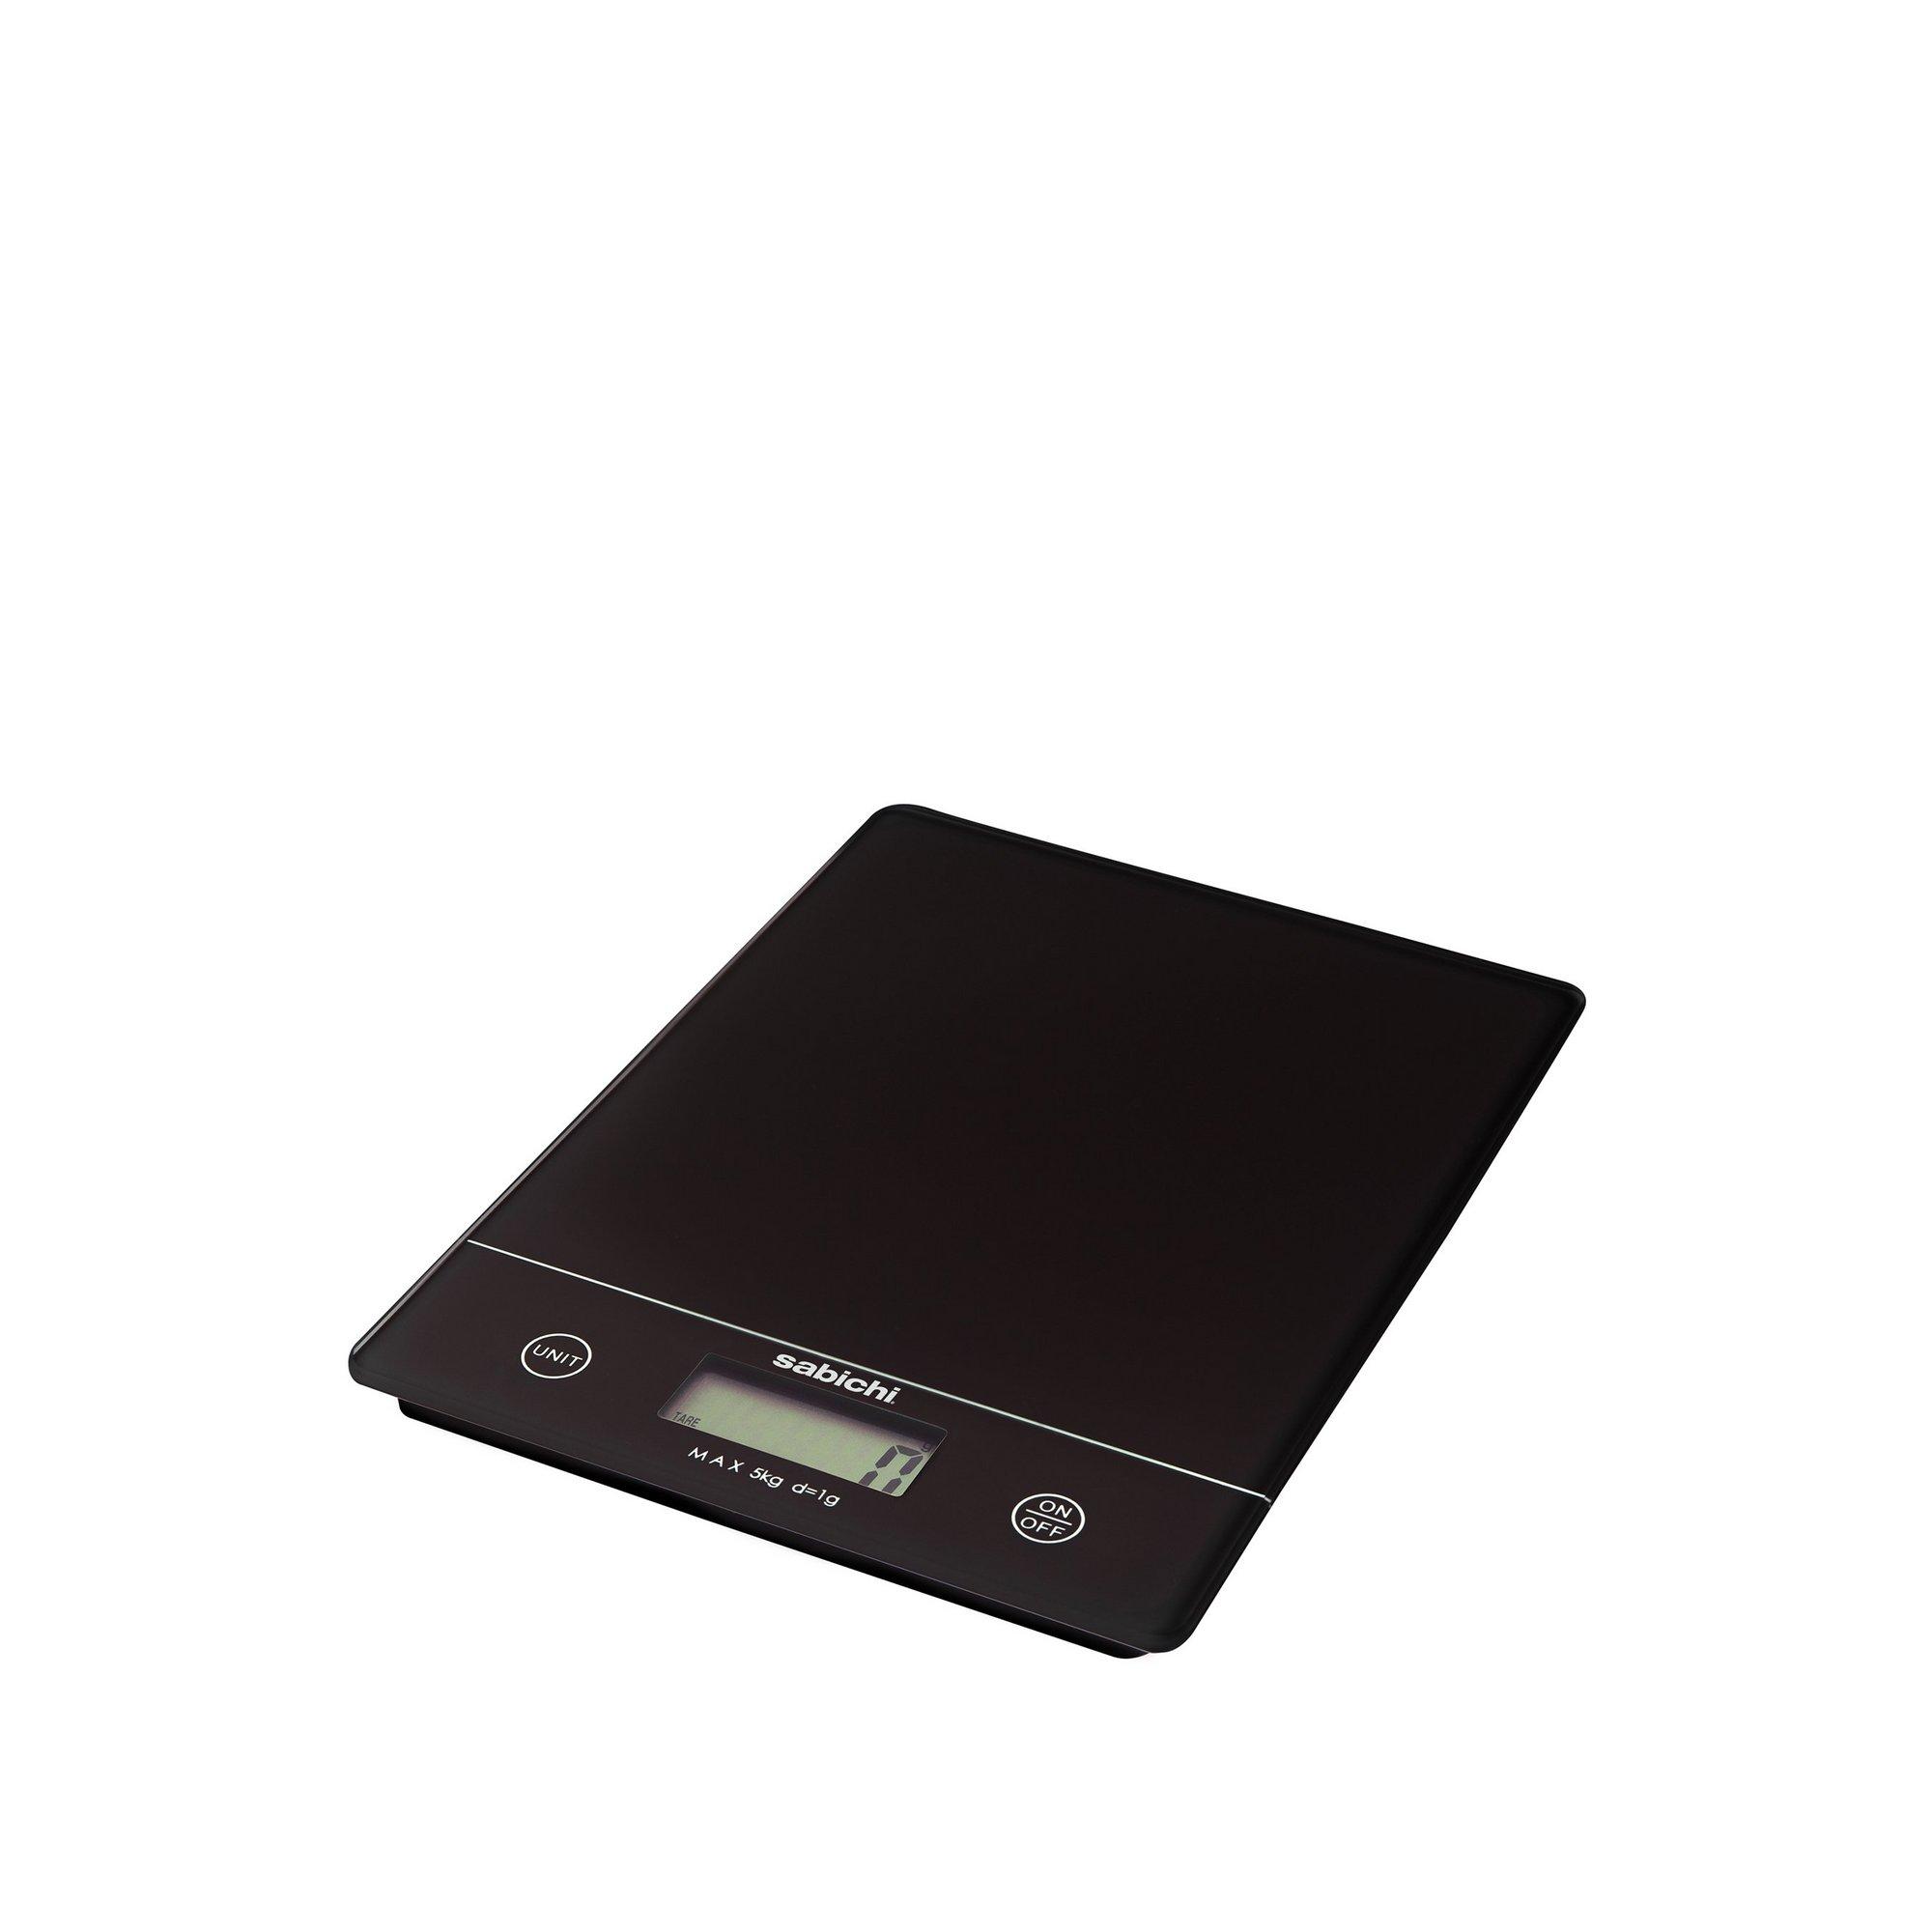 Image of Sabichi Digital Kitchen Scales